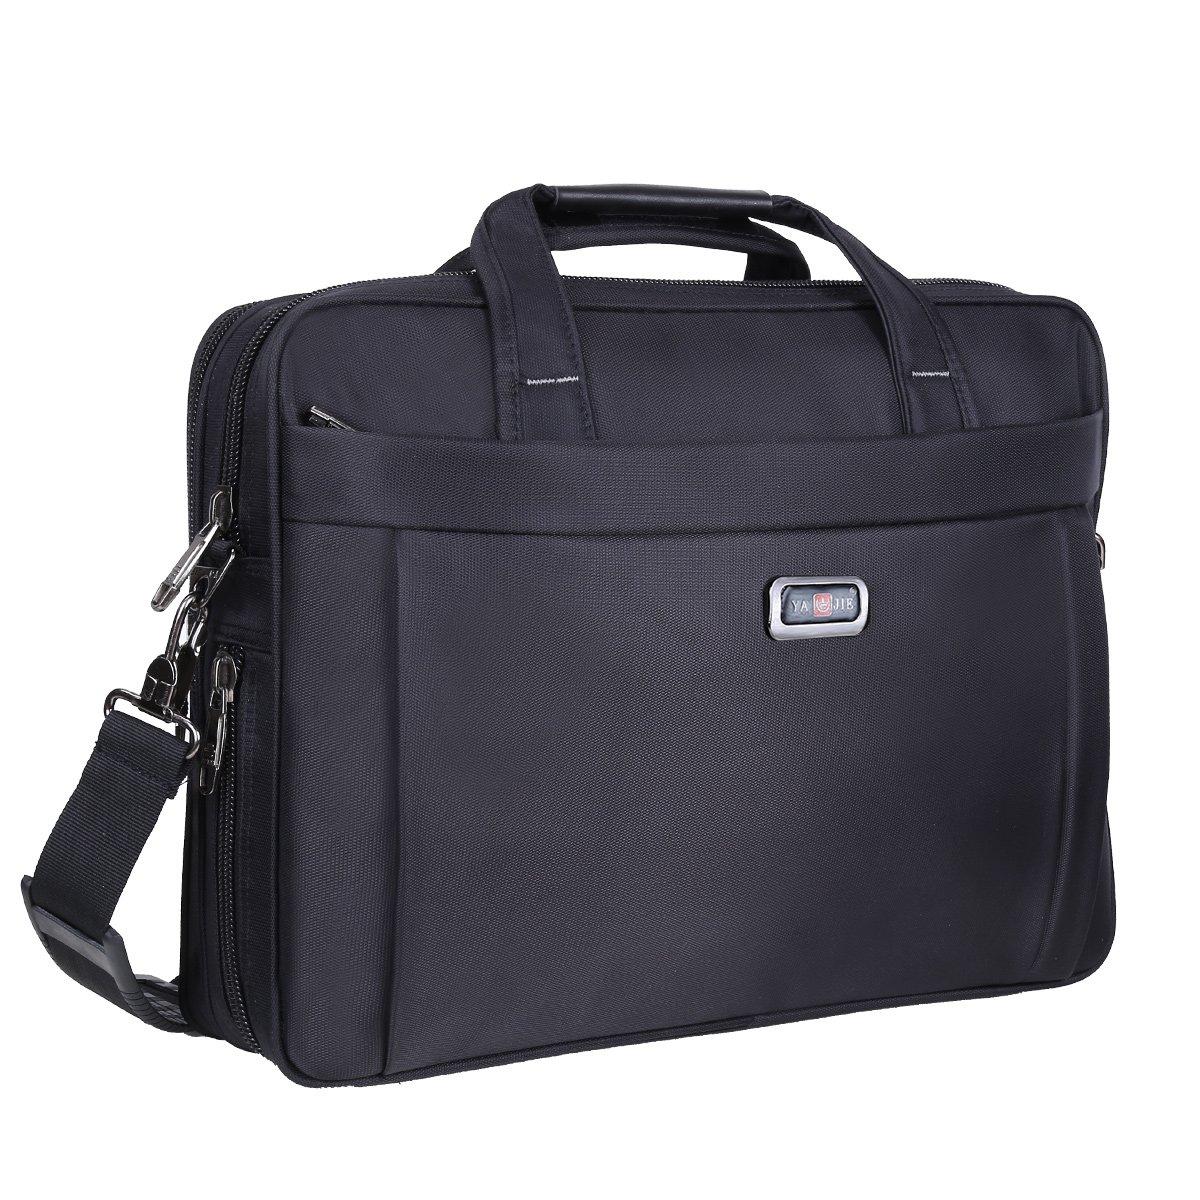 Briefcase Bag, 15.6 Inch Laptop Bag, Stylish Nylon Multi-functional Organizer Messenger Shoulder Bags for Men Women Fit for 15